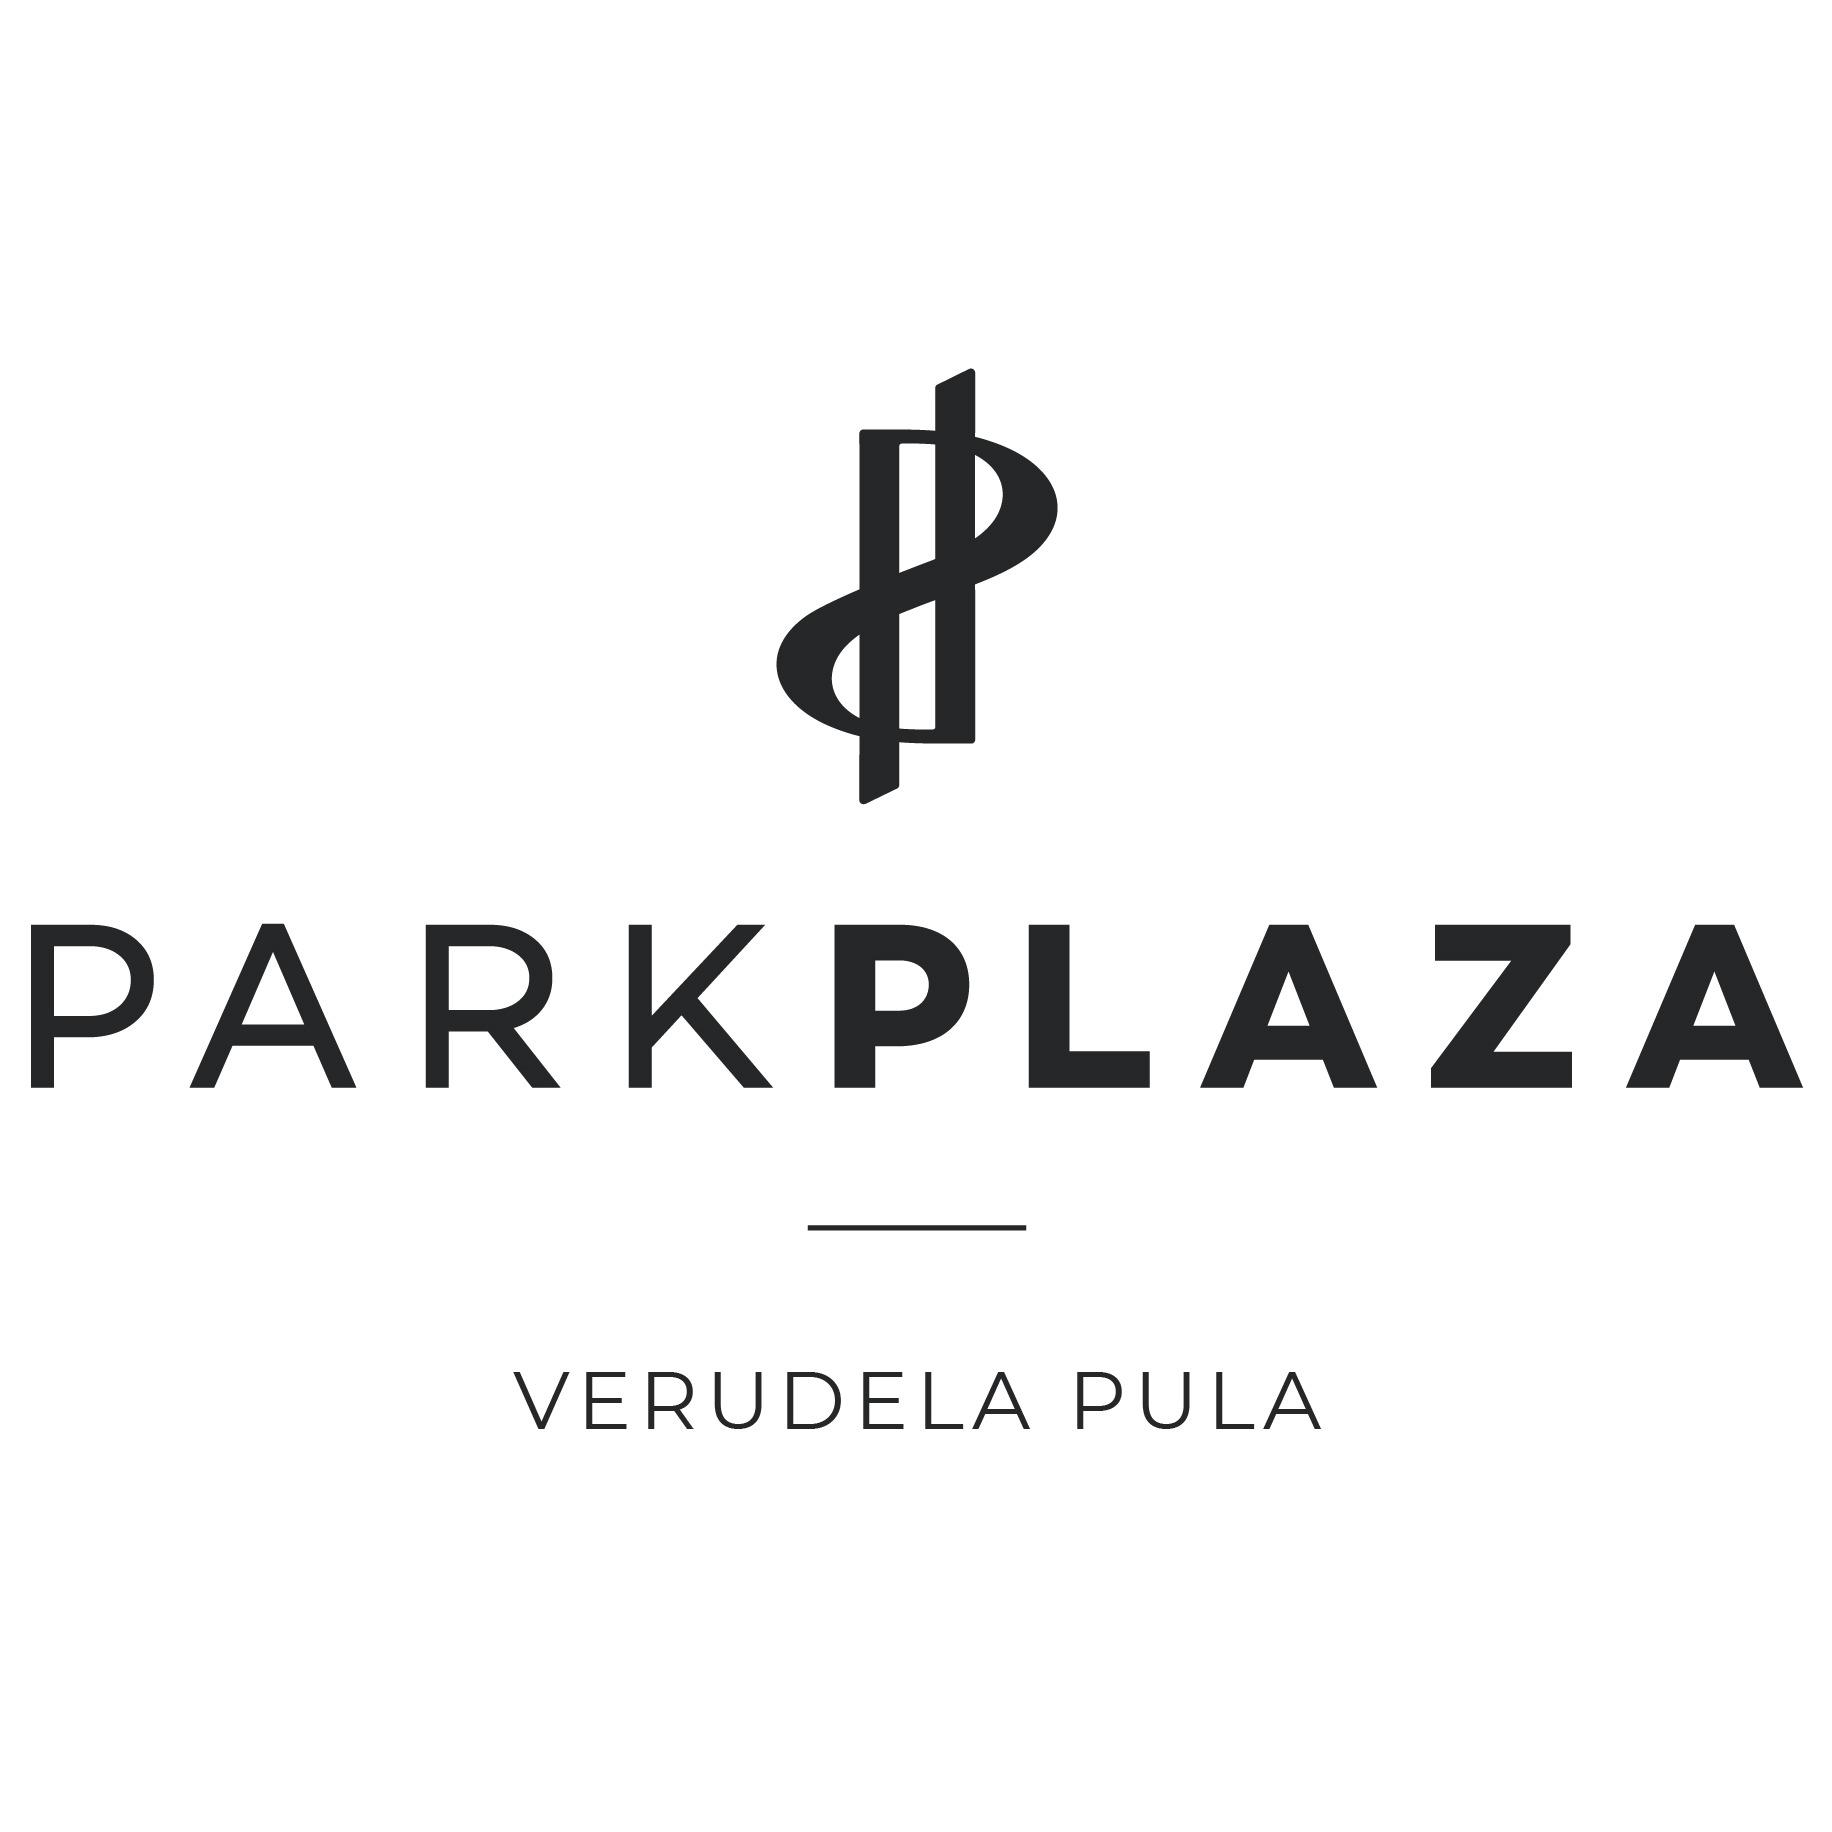 Park Plaza Verudela Pula